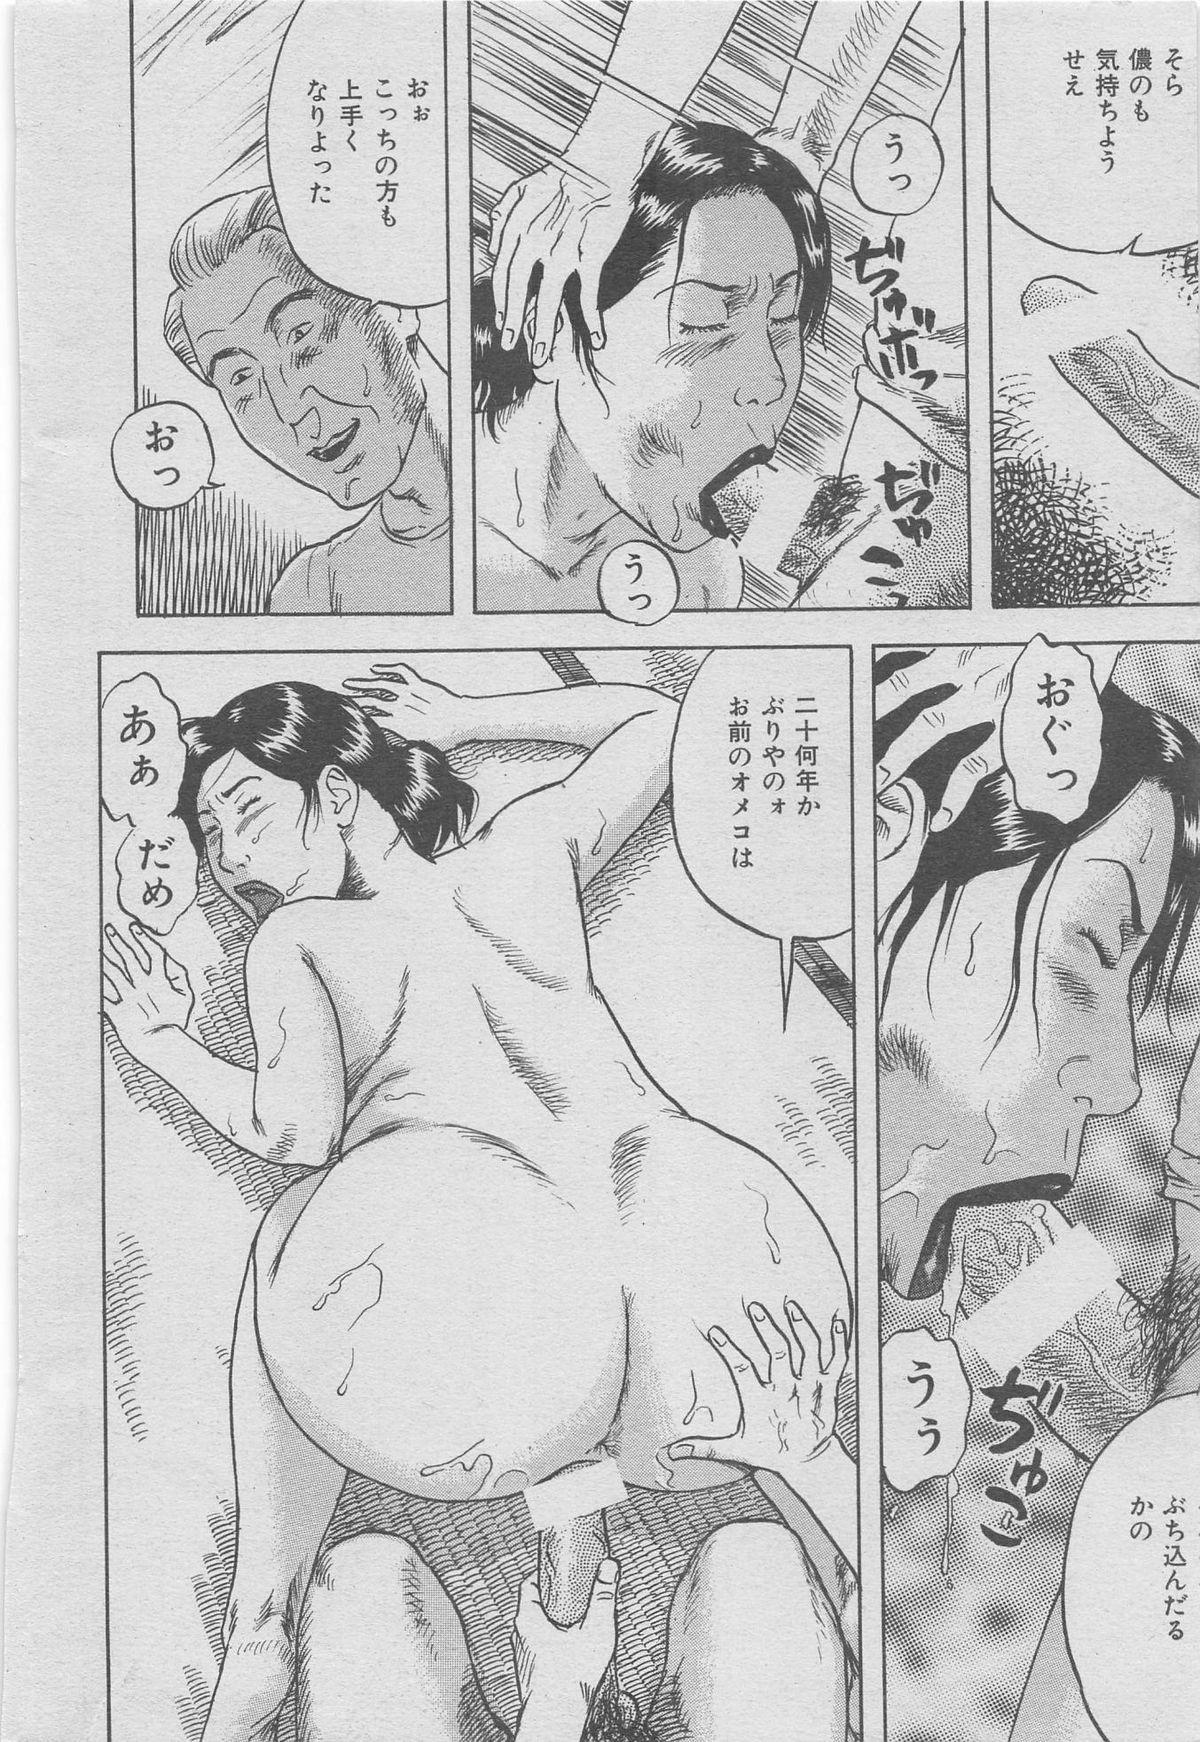 Hontou ni Atta Kindanai vol.7 123